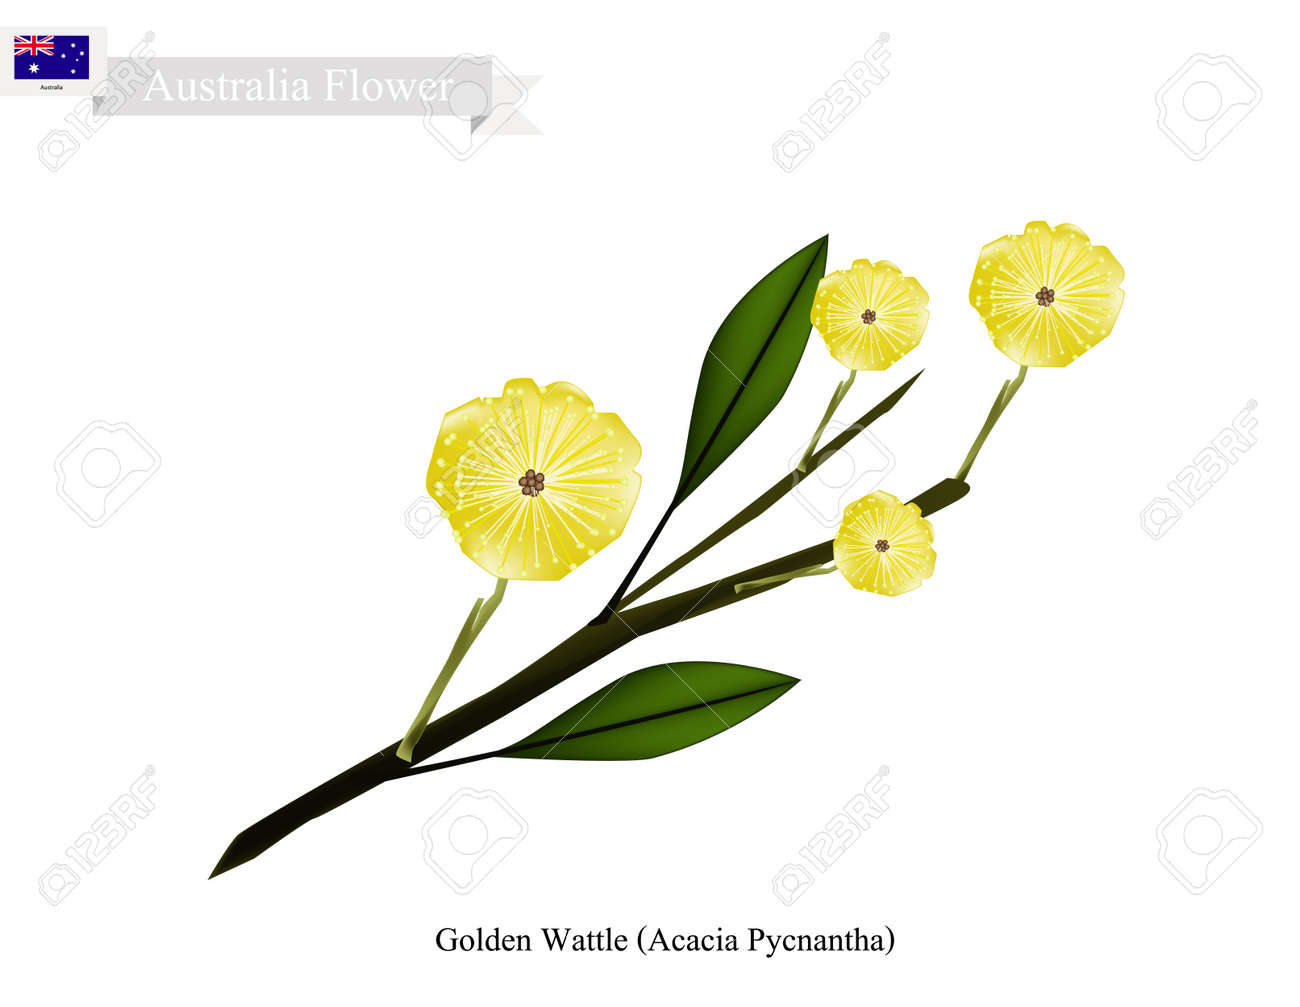 Australia Flower Illustration Of Golden Wattle Flowers Or Acacia